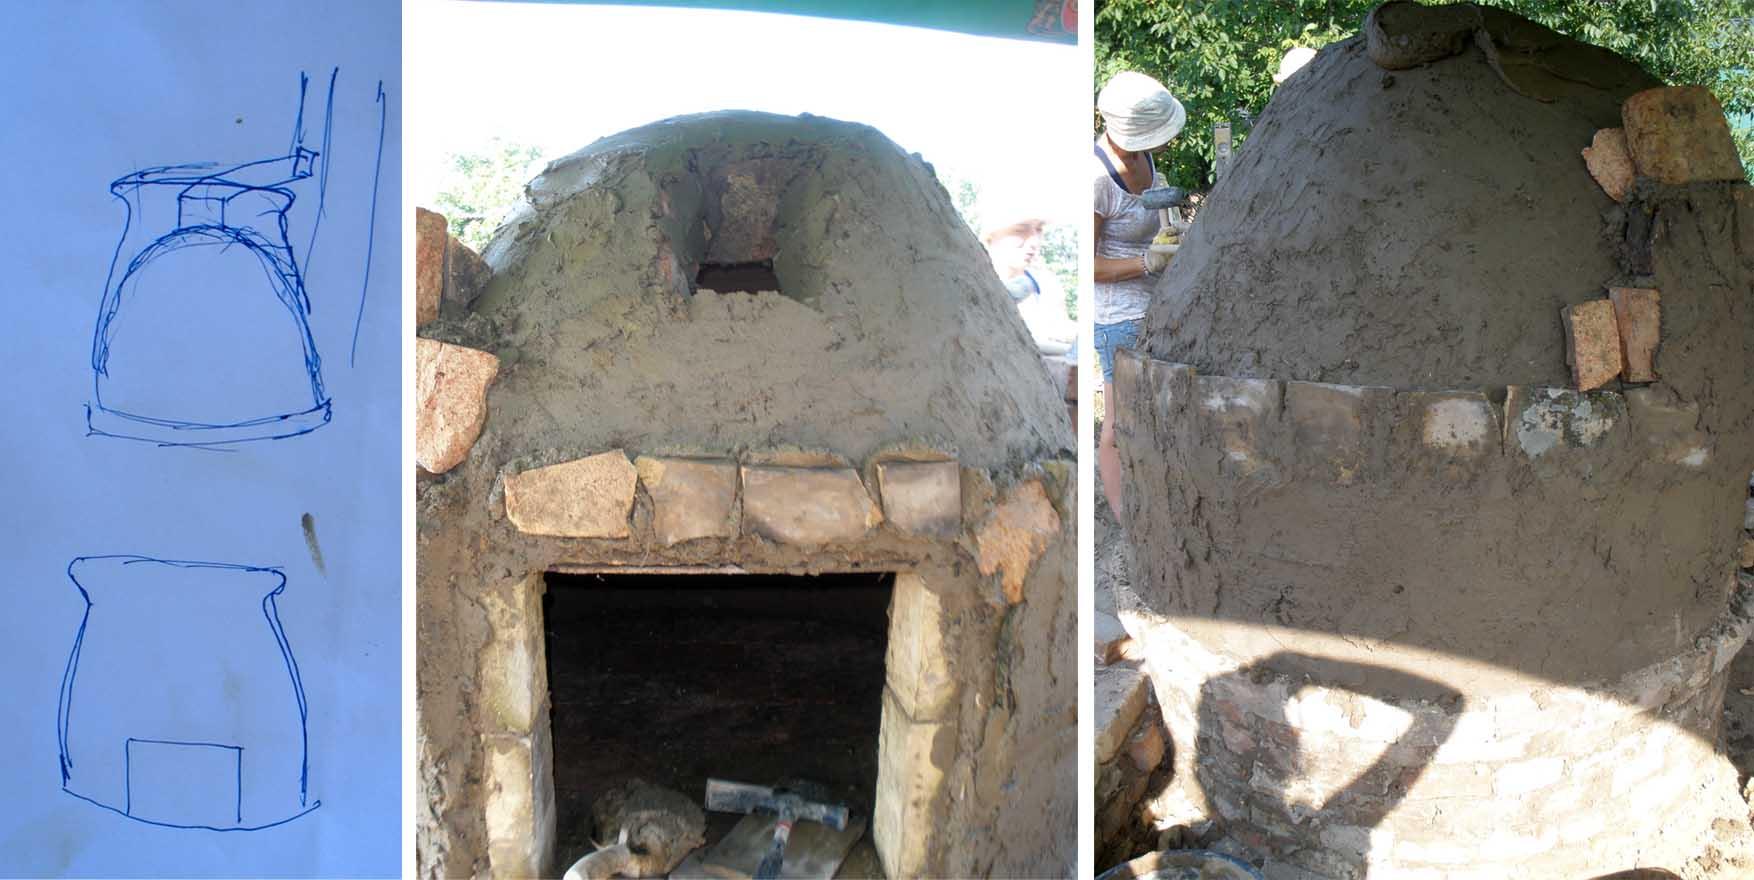 36 pećke Vass Zoltan žemska pećka radionica zidanje cetvrti dan